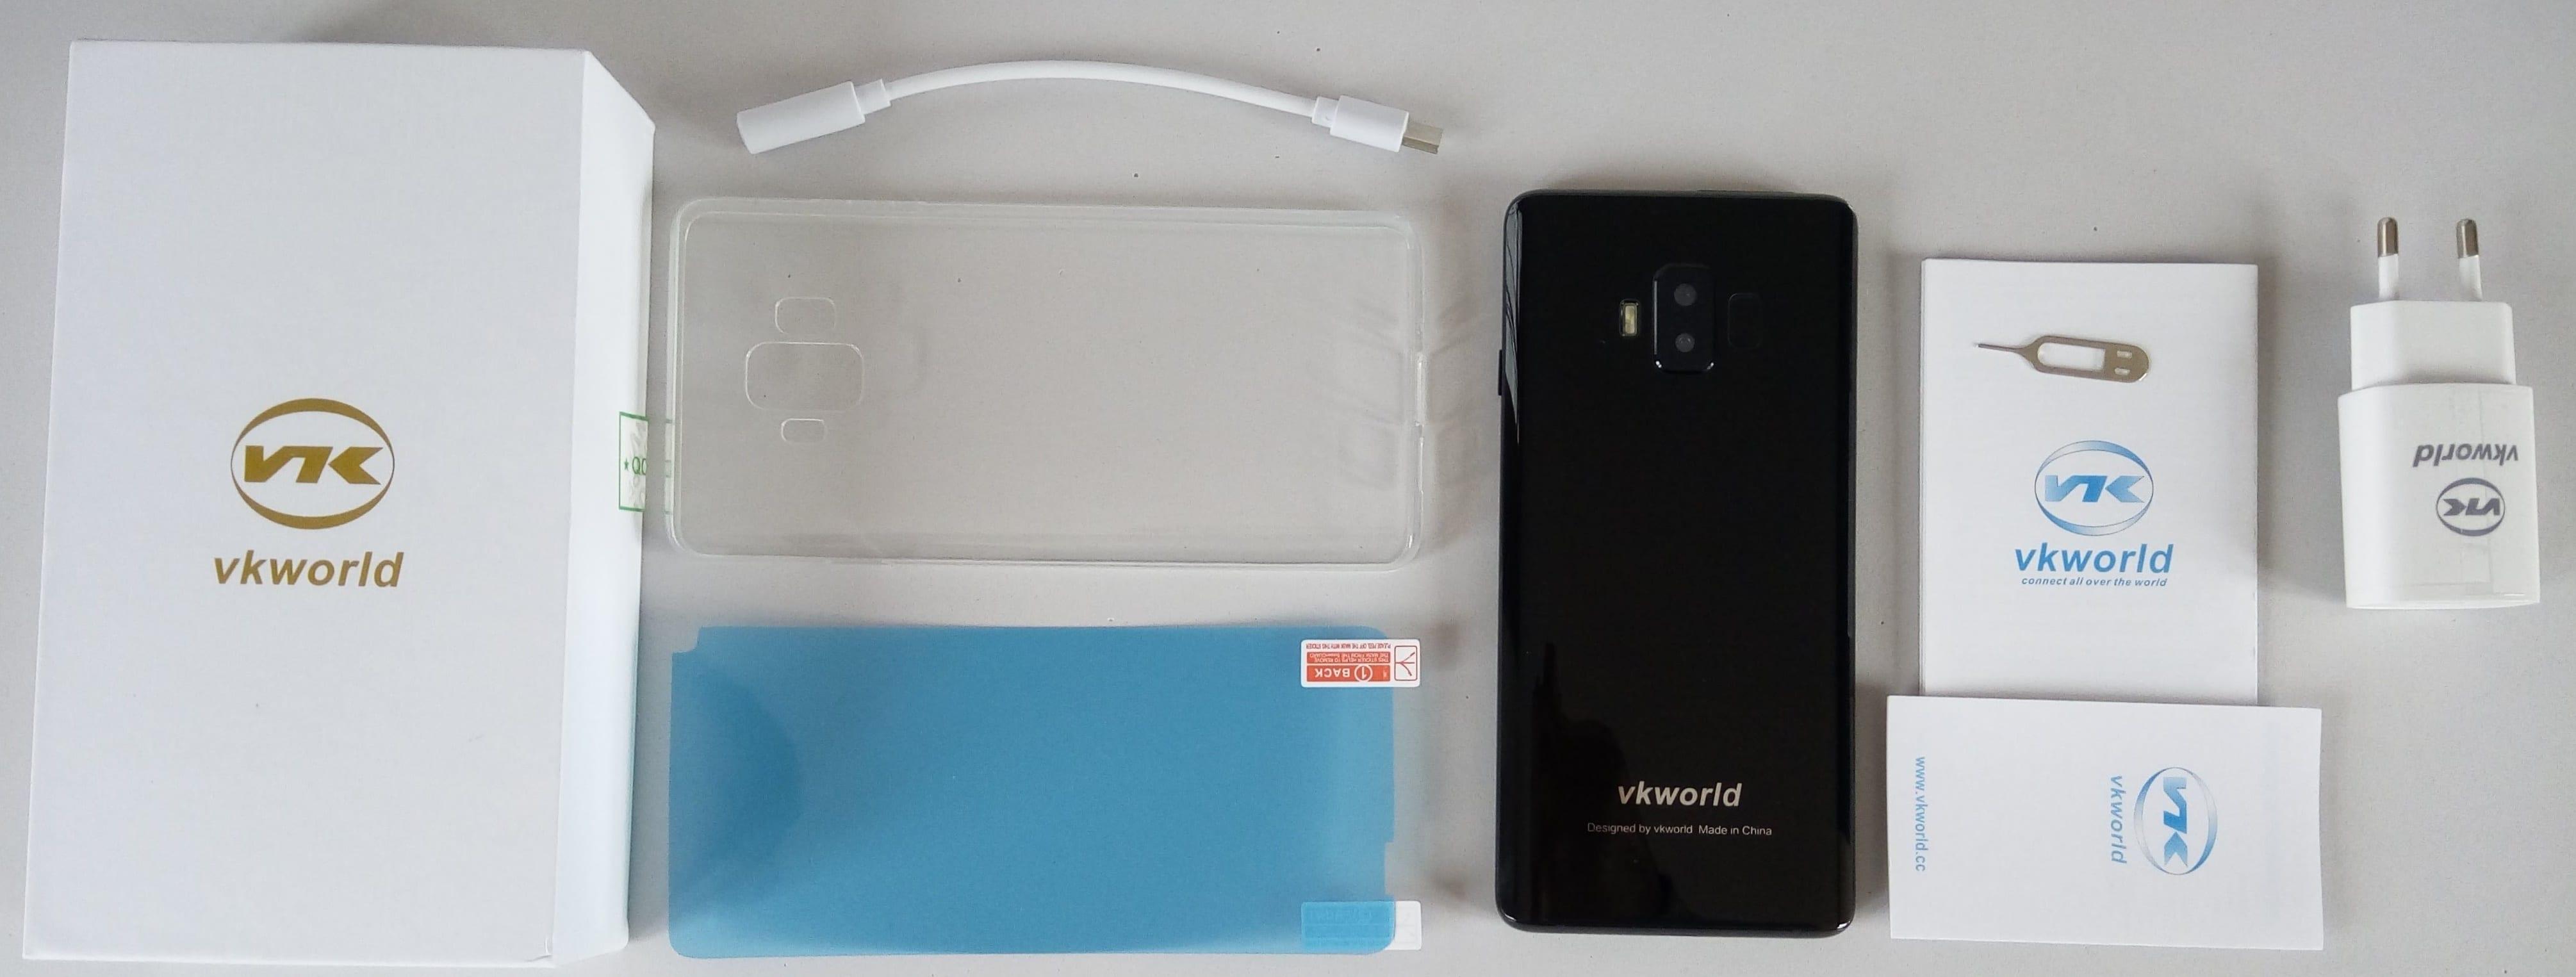 vkworld S8 contenido de la caja